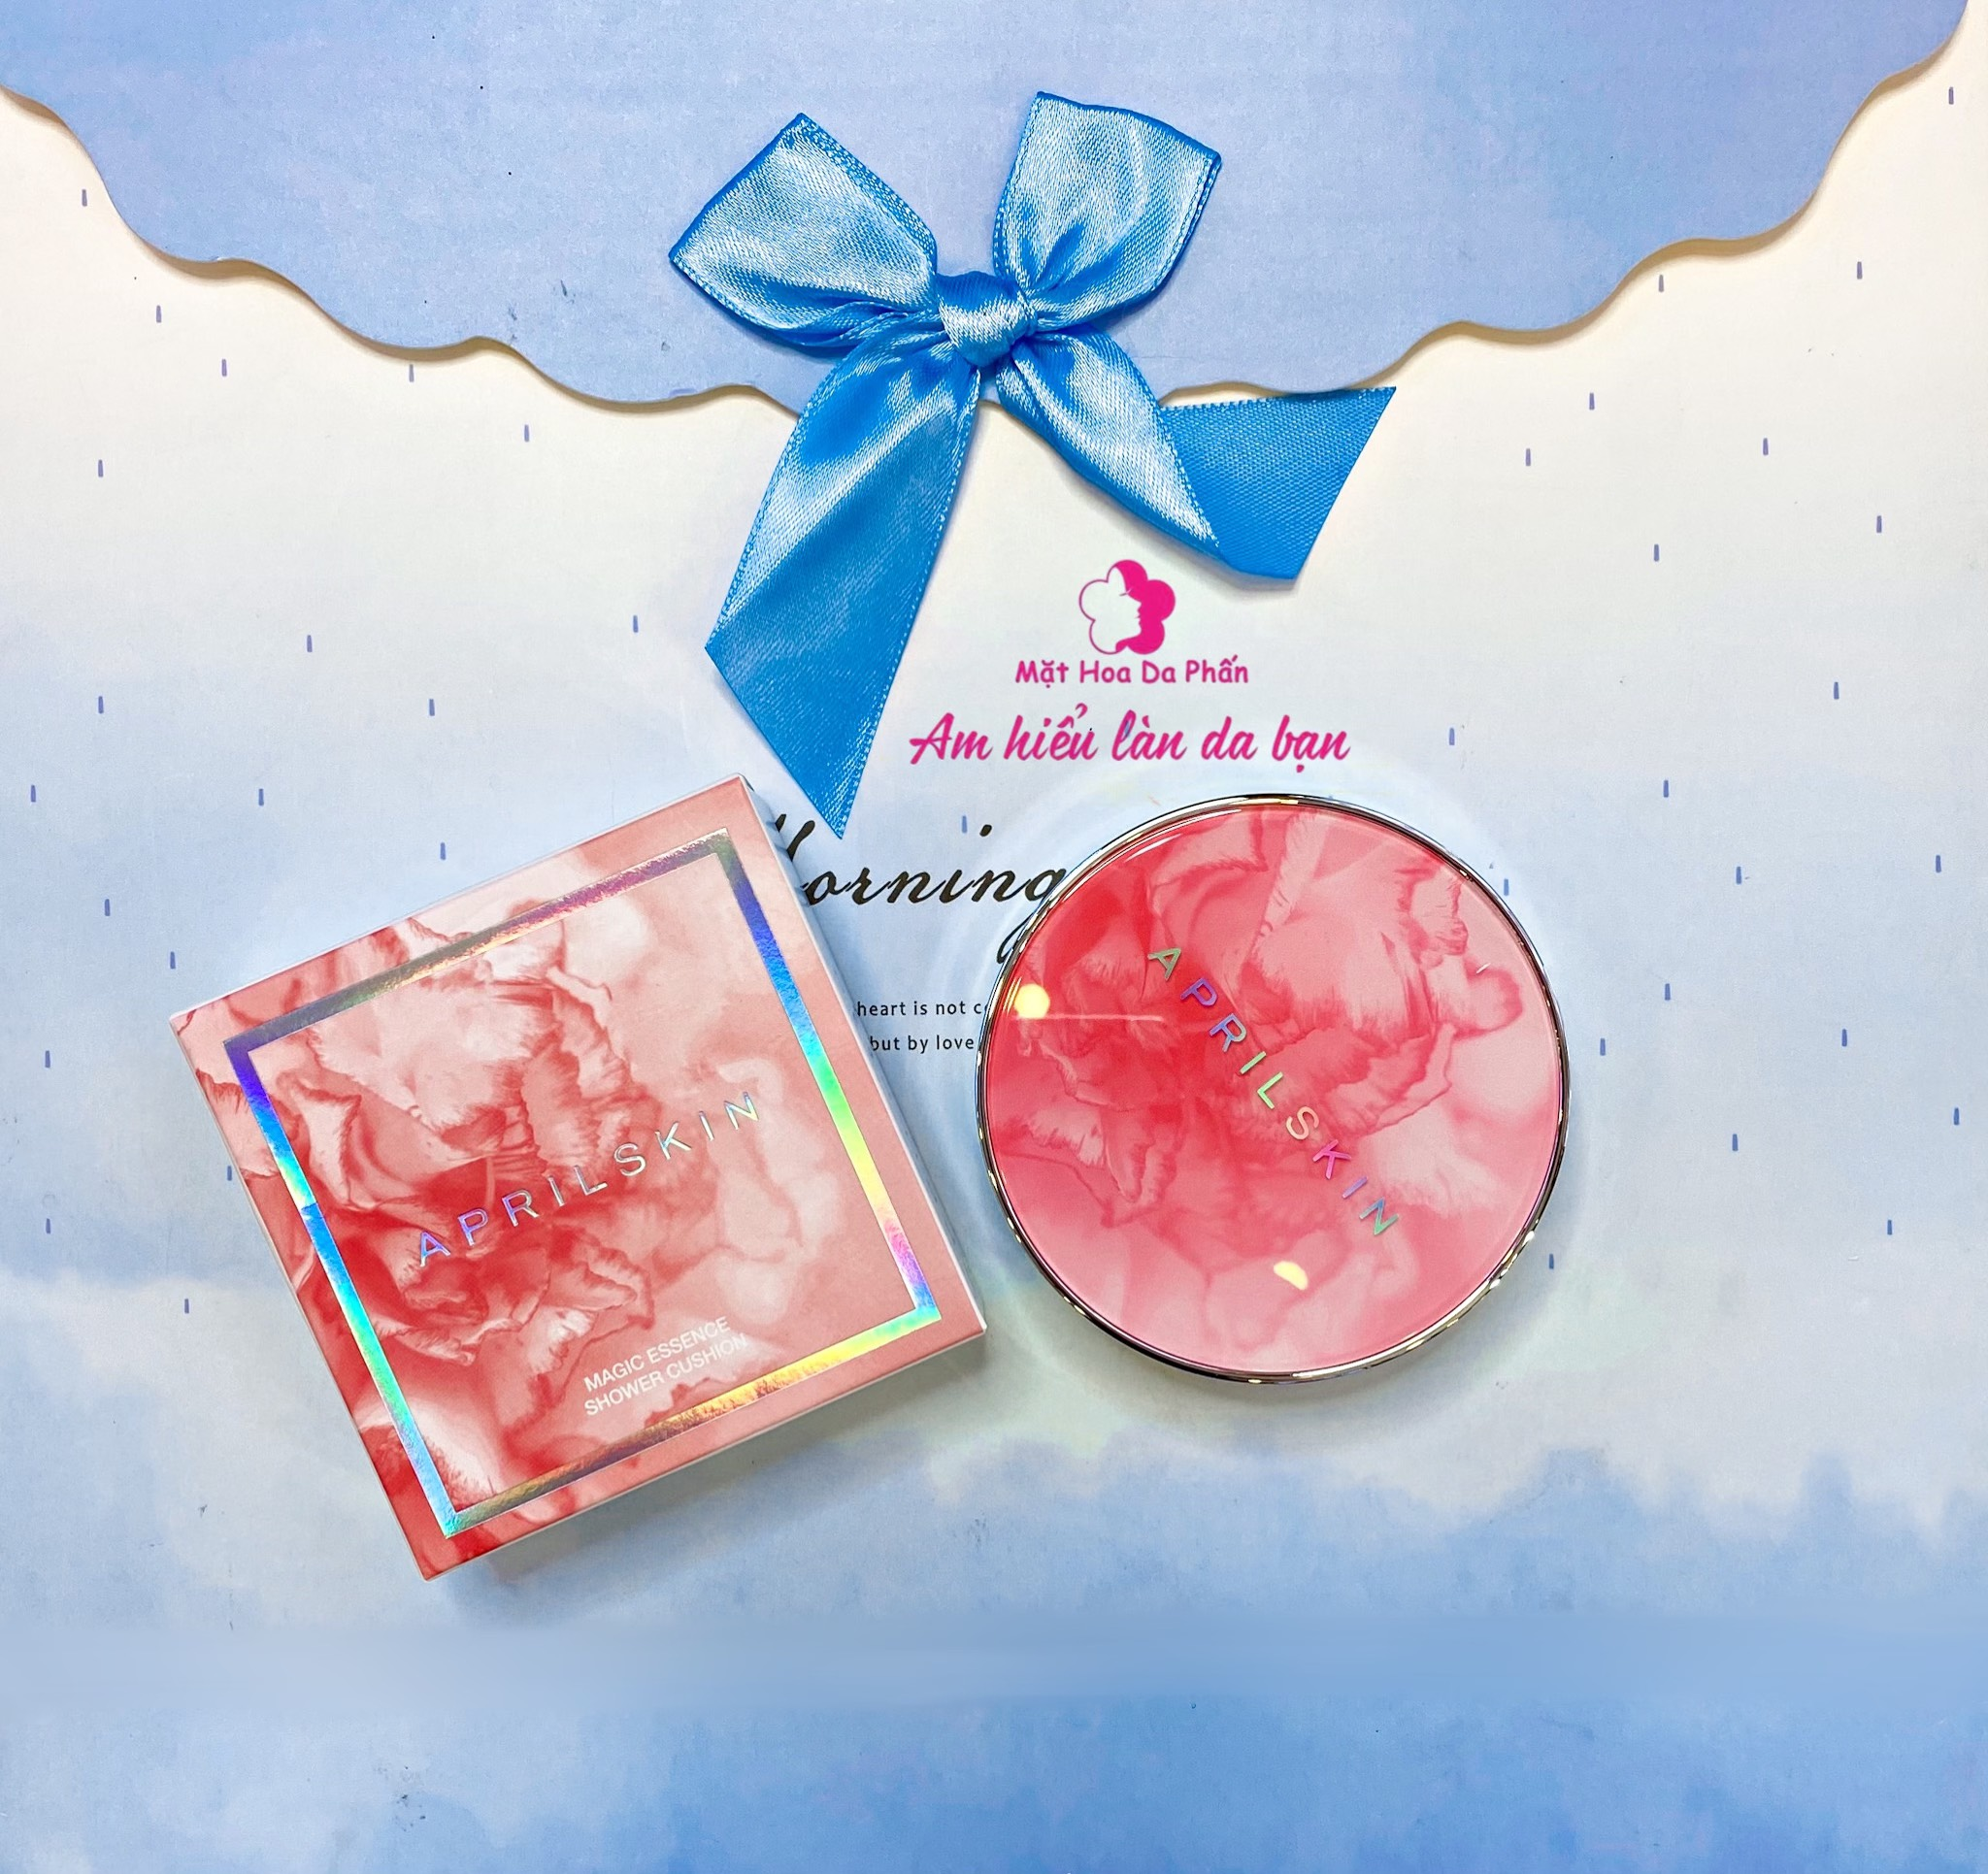 Cushion April SKin Magic Essence Shower #21 (Hồng Marble)